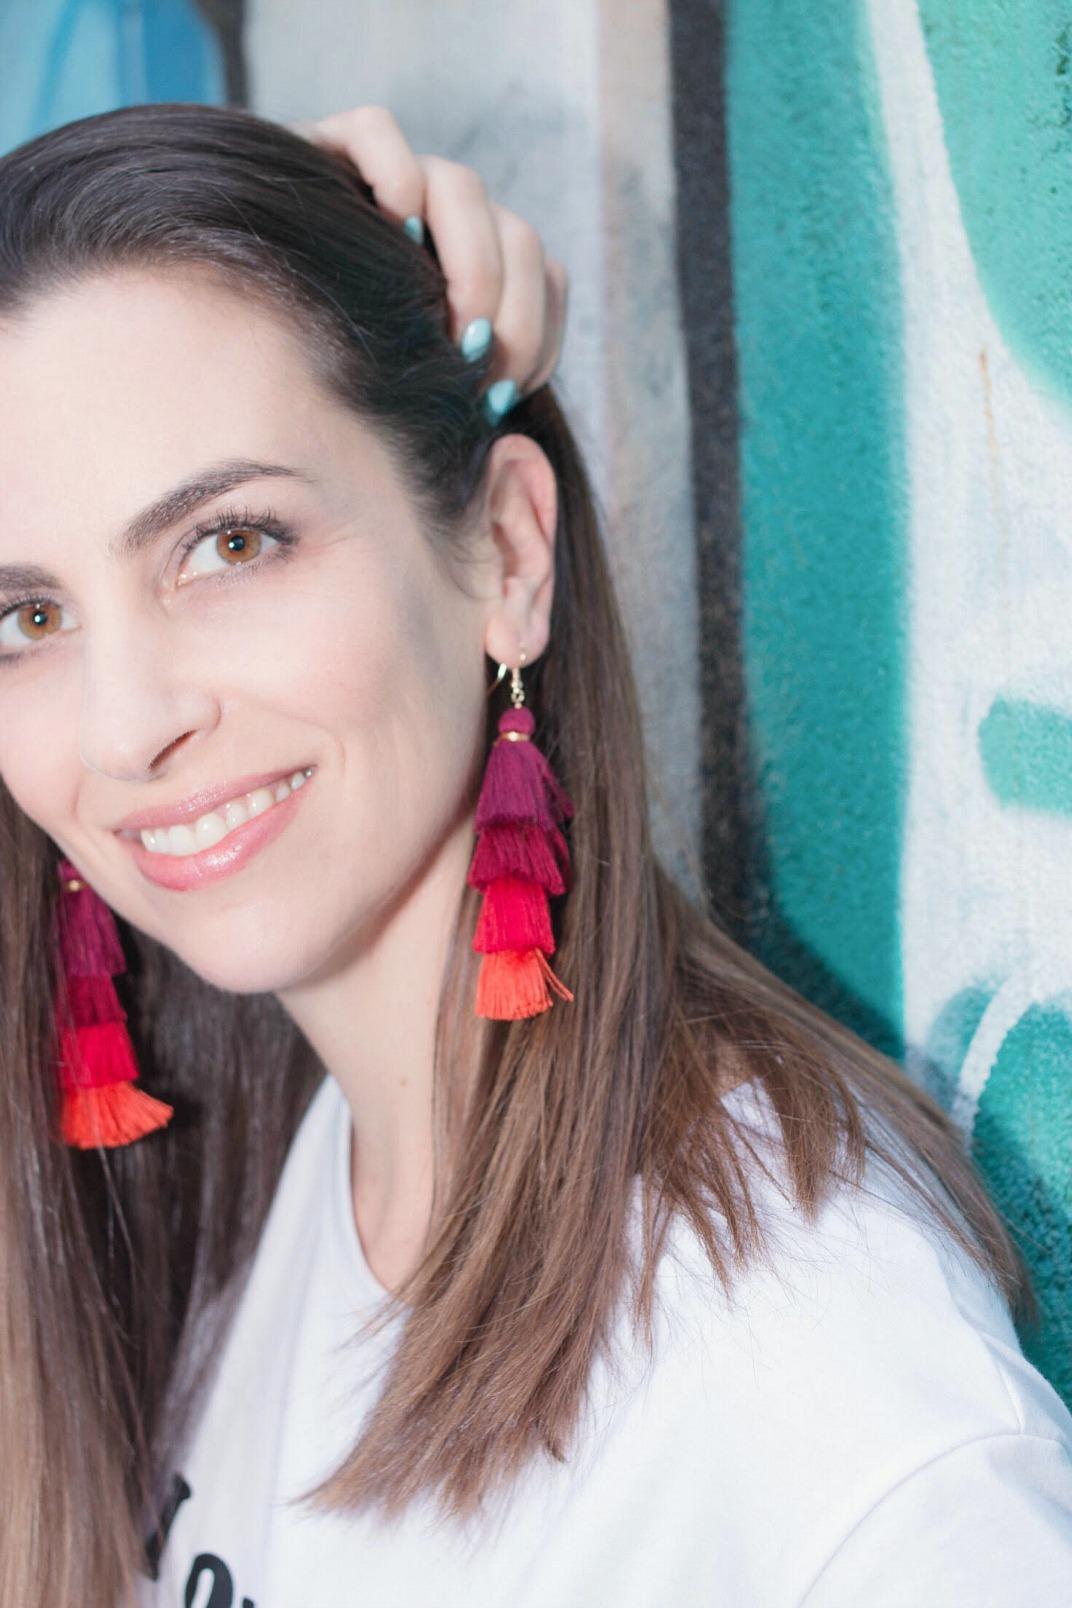 Deborah Perlman Cocus Pocus close up